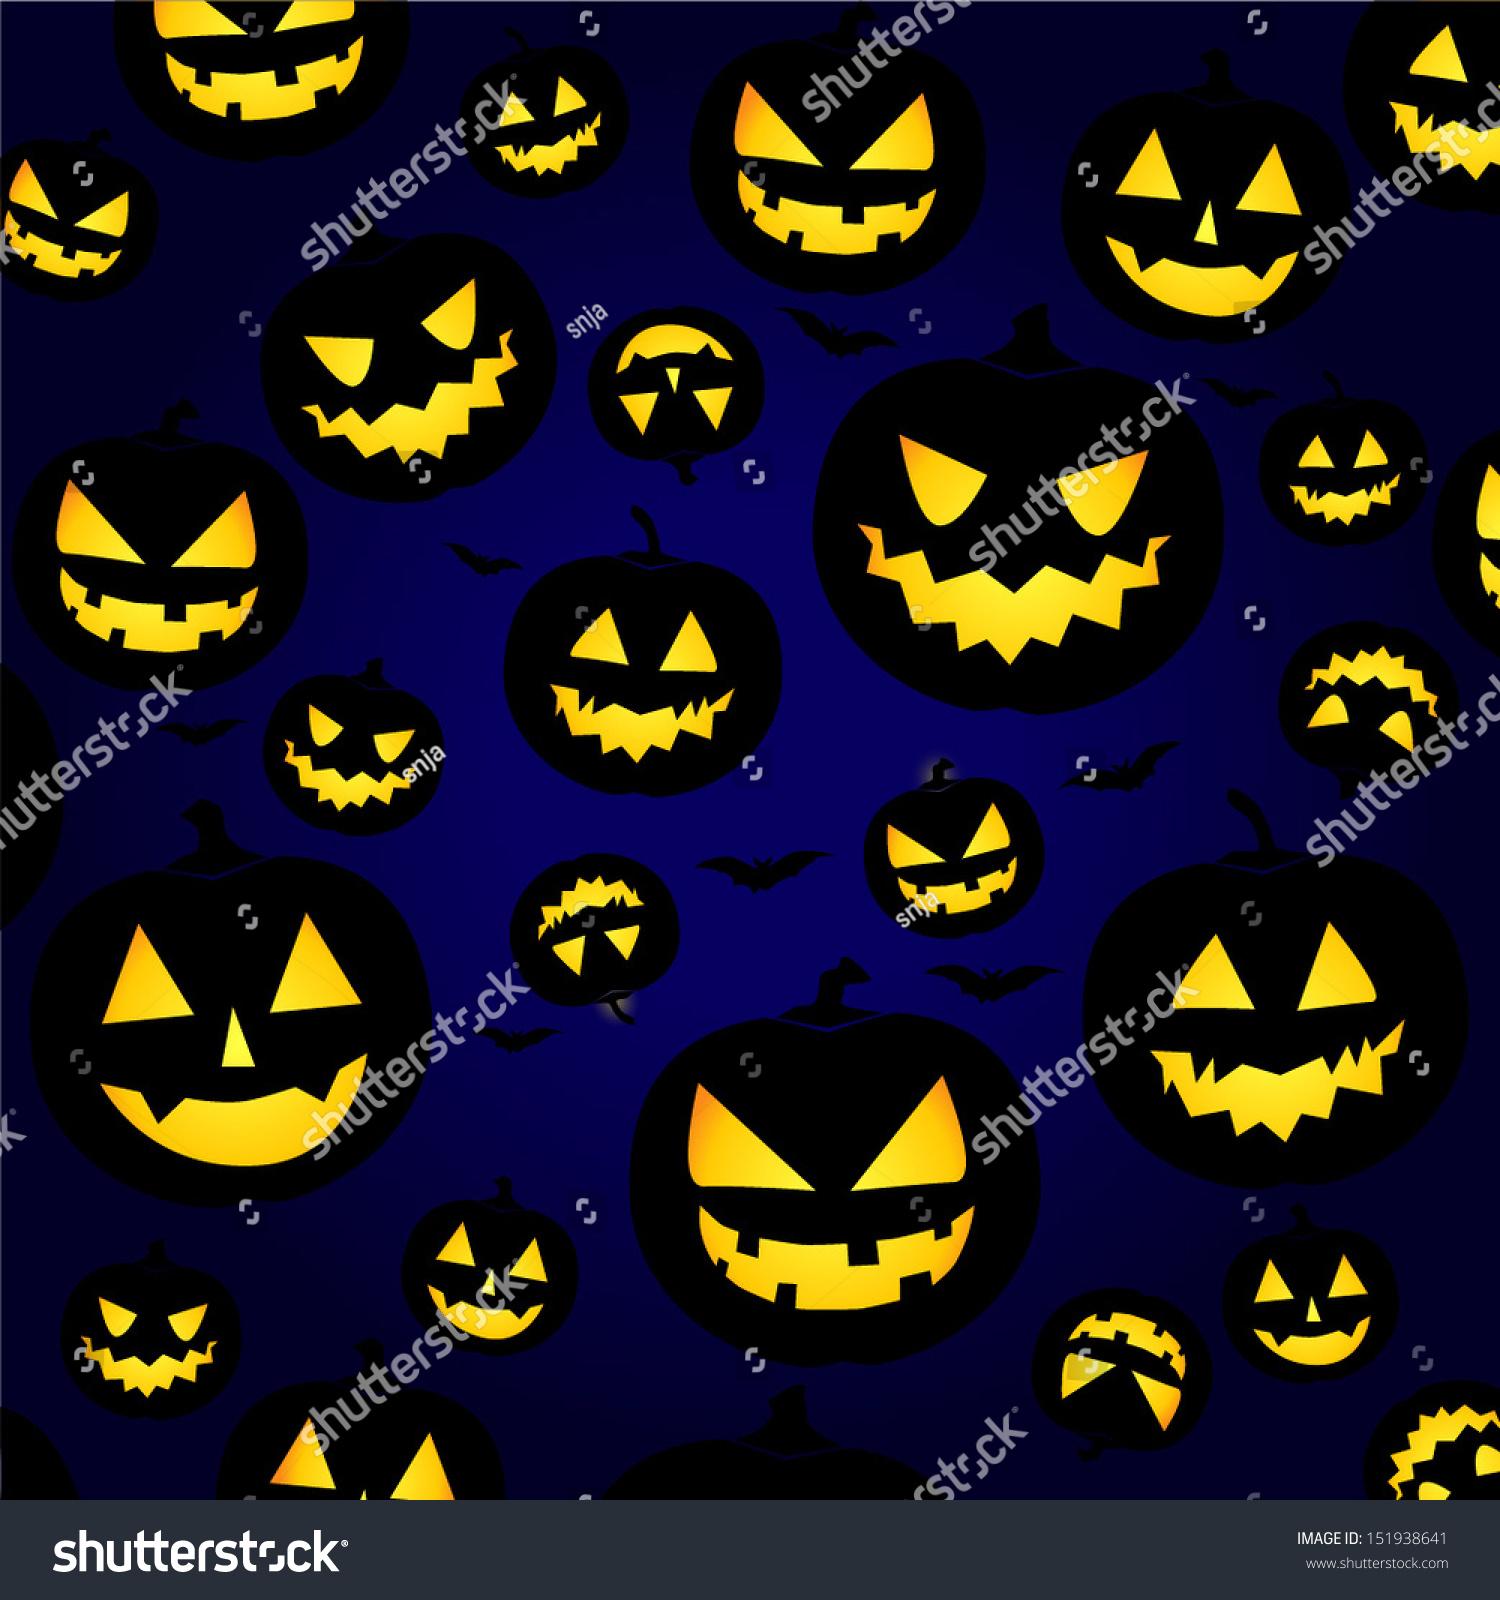 Fantastic Wallpaper Halloween Batman - stock-vector-jack-o-lantern-background-halloween-pumpkin-wallpaper-vector-illustration-eps-151938641  You Should Have_494576.jpg